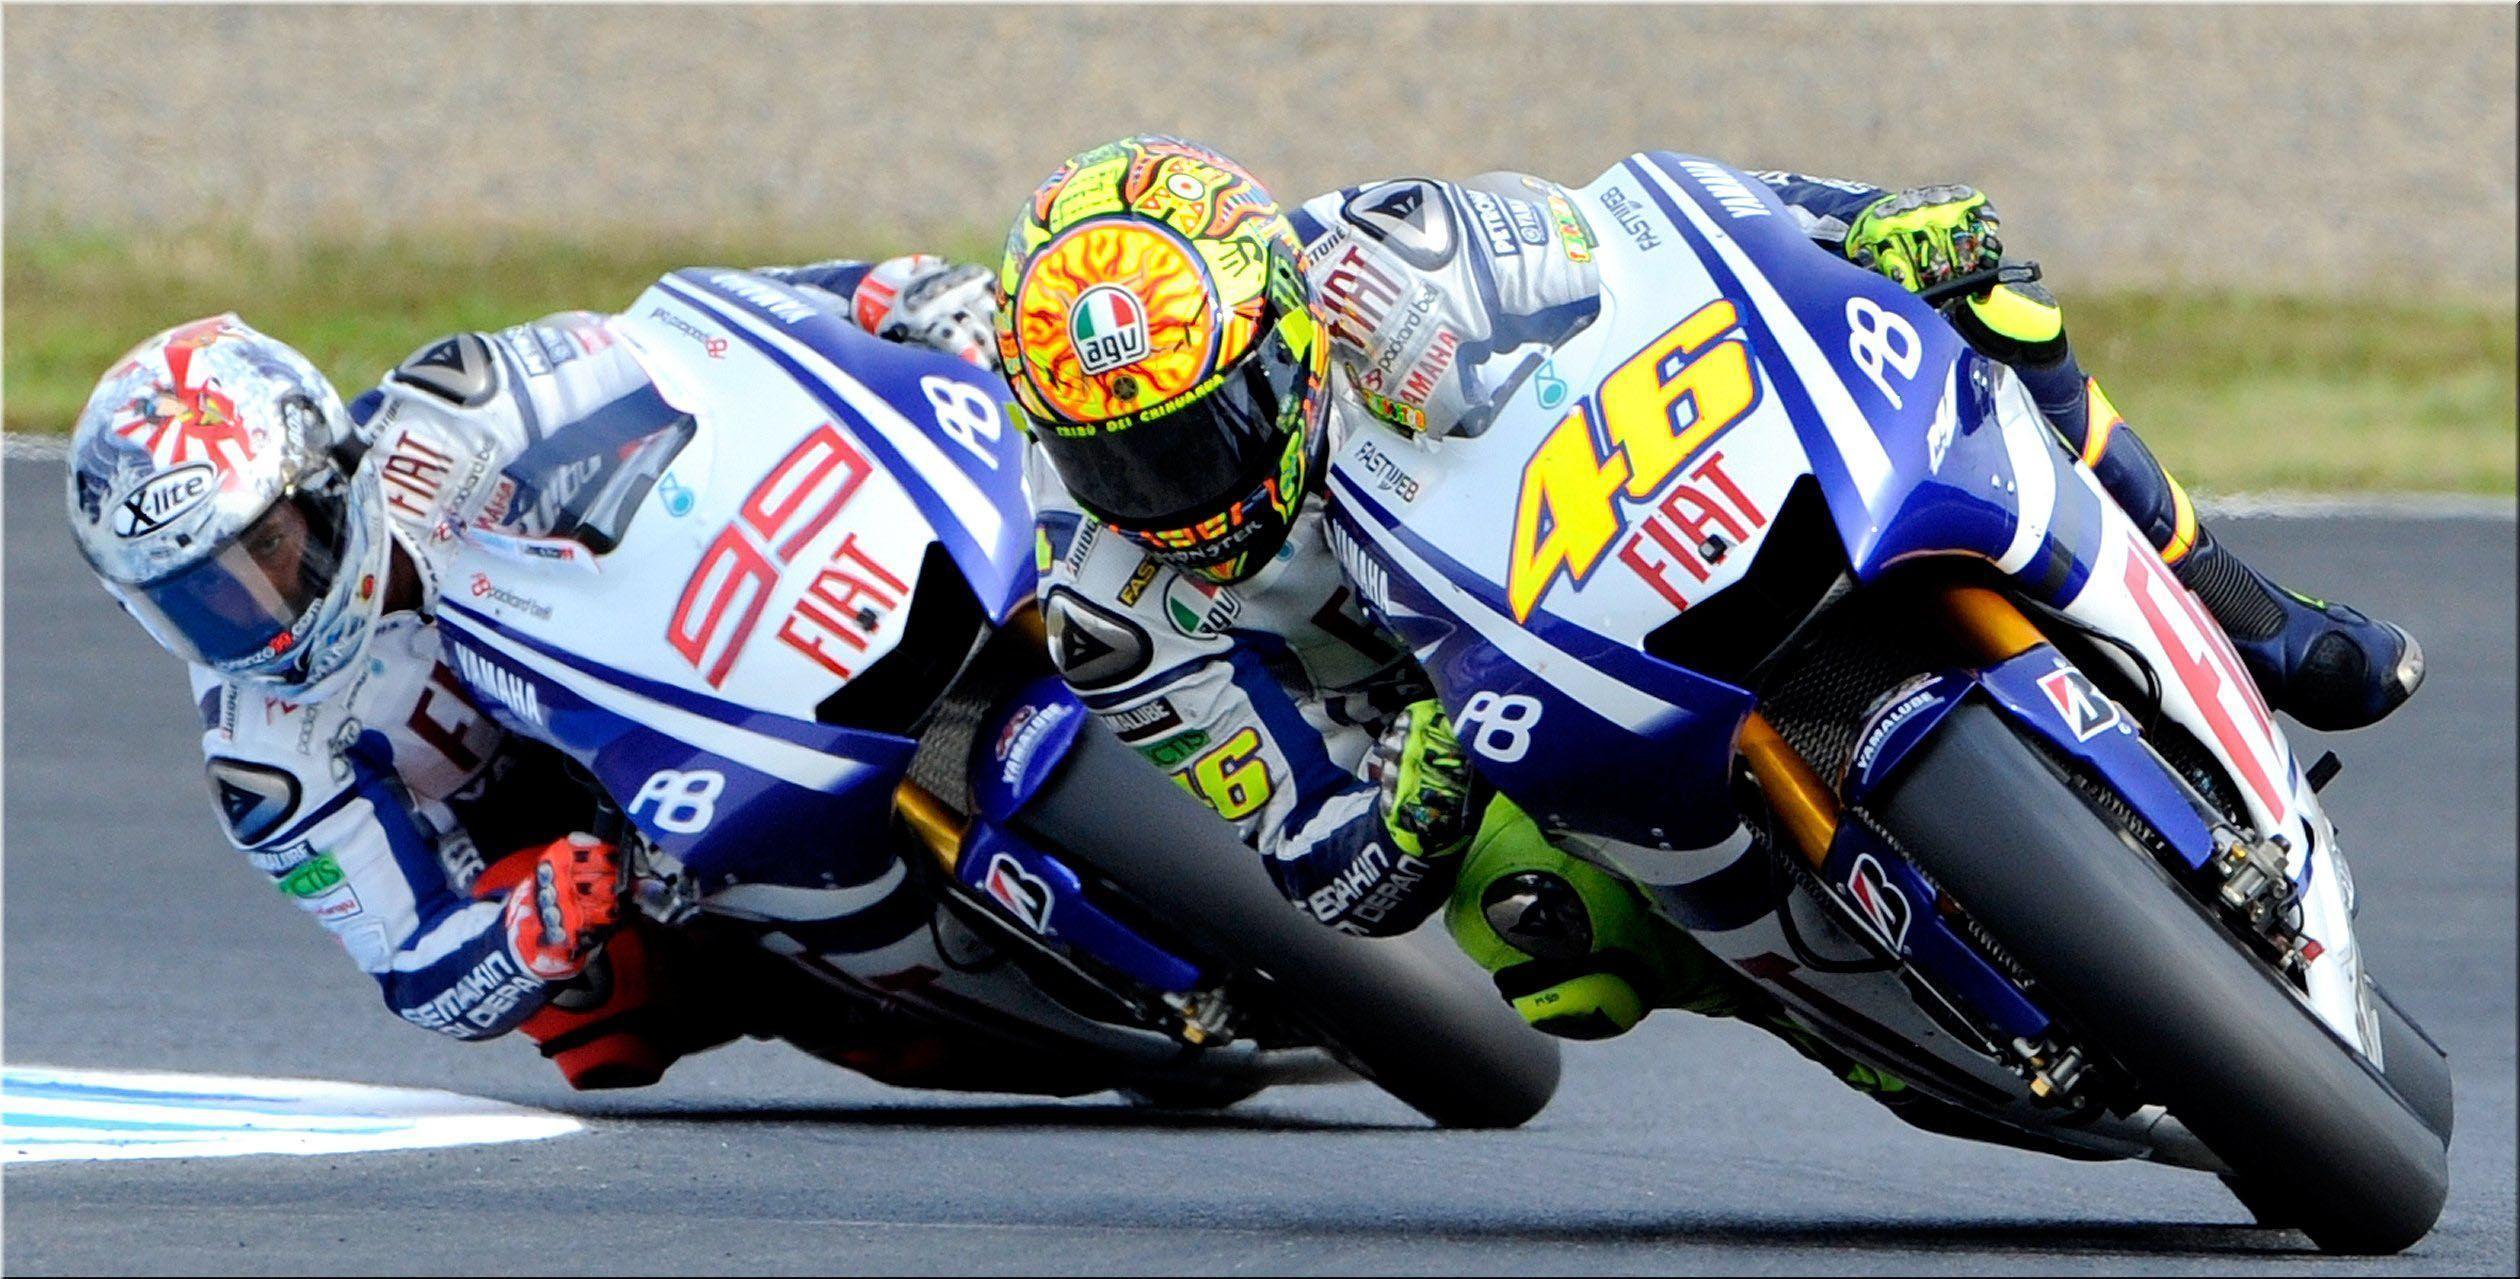 Moto GP Wallpapers 2520x1279